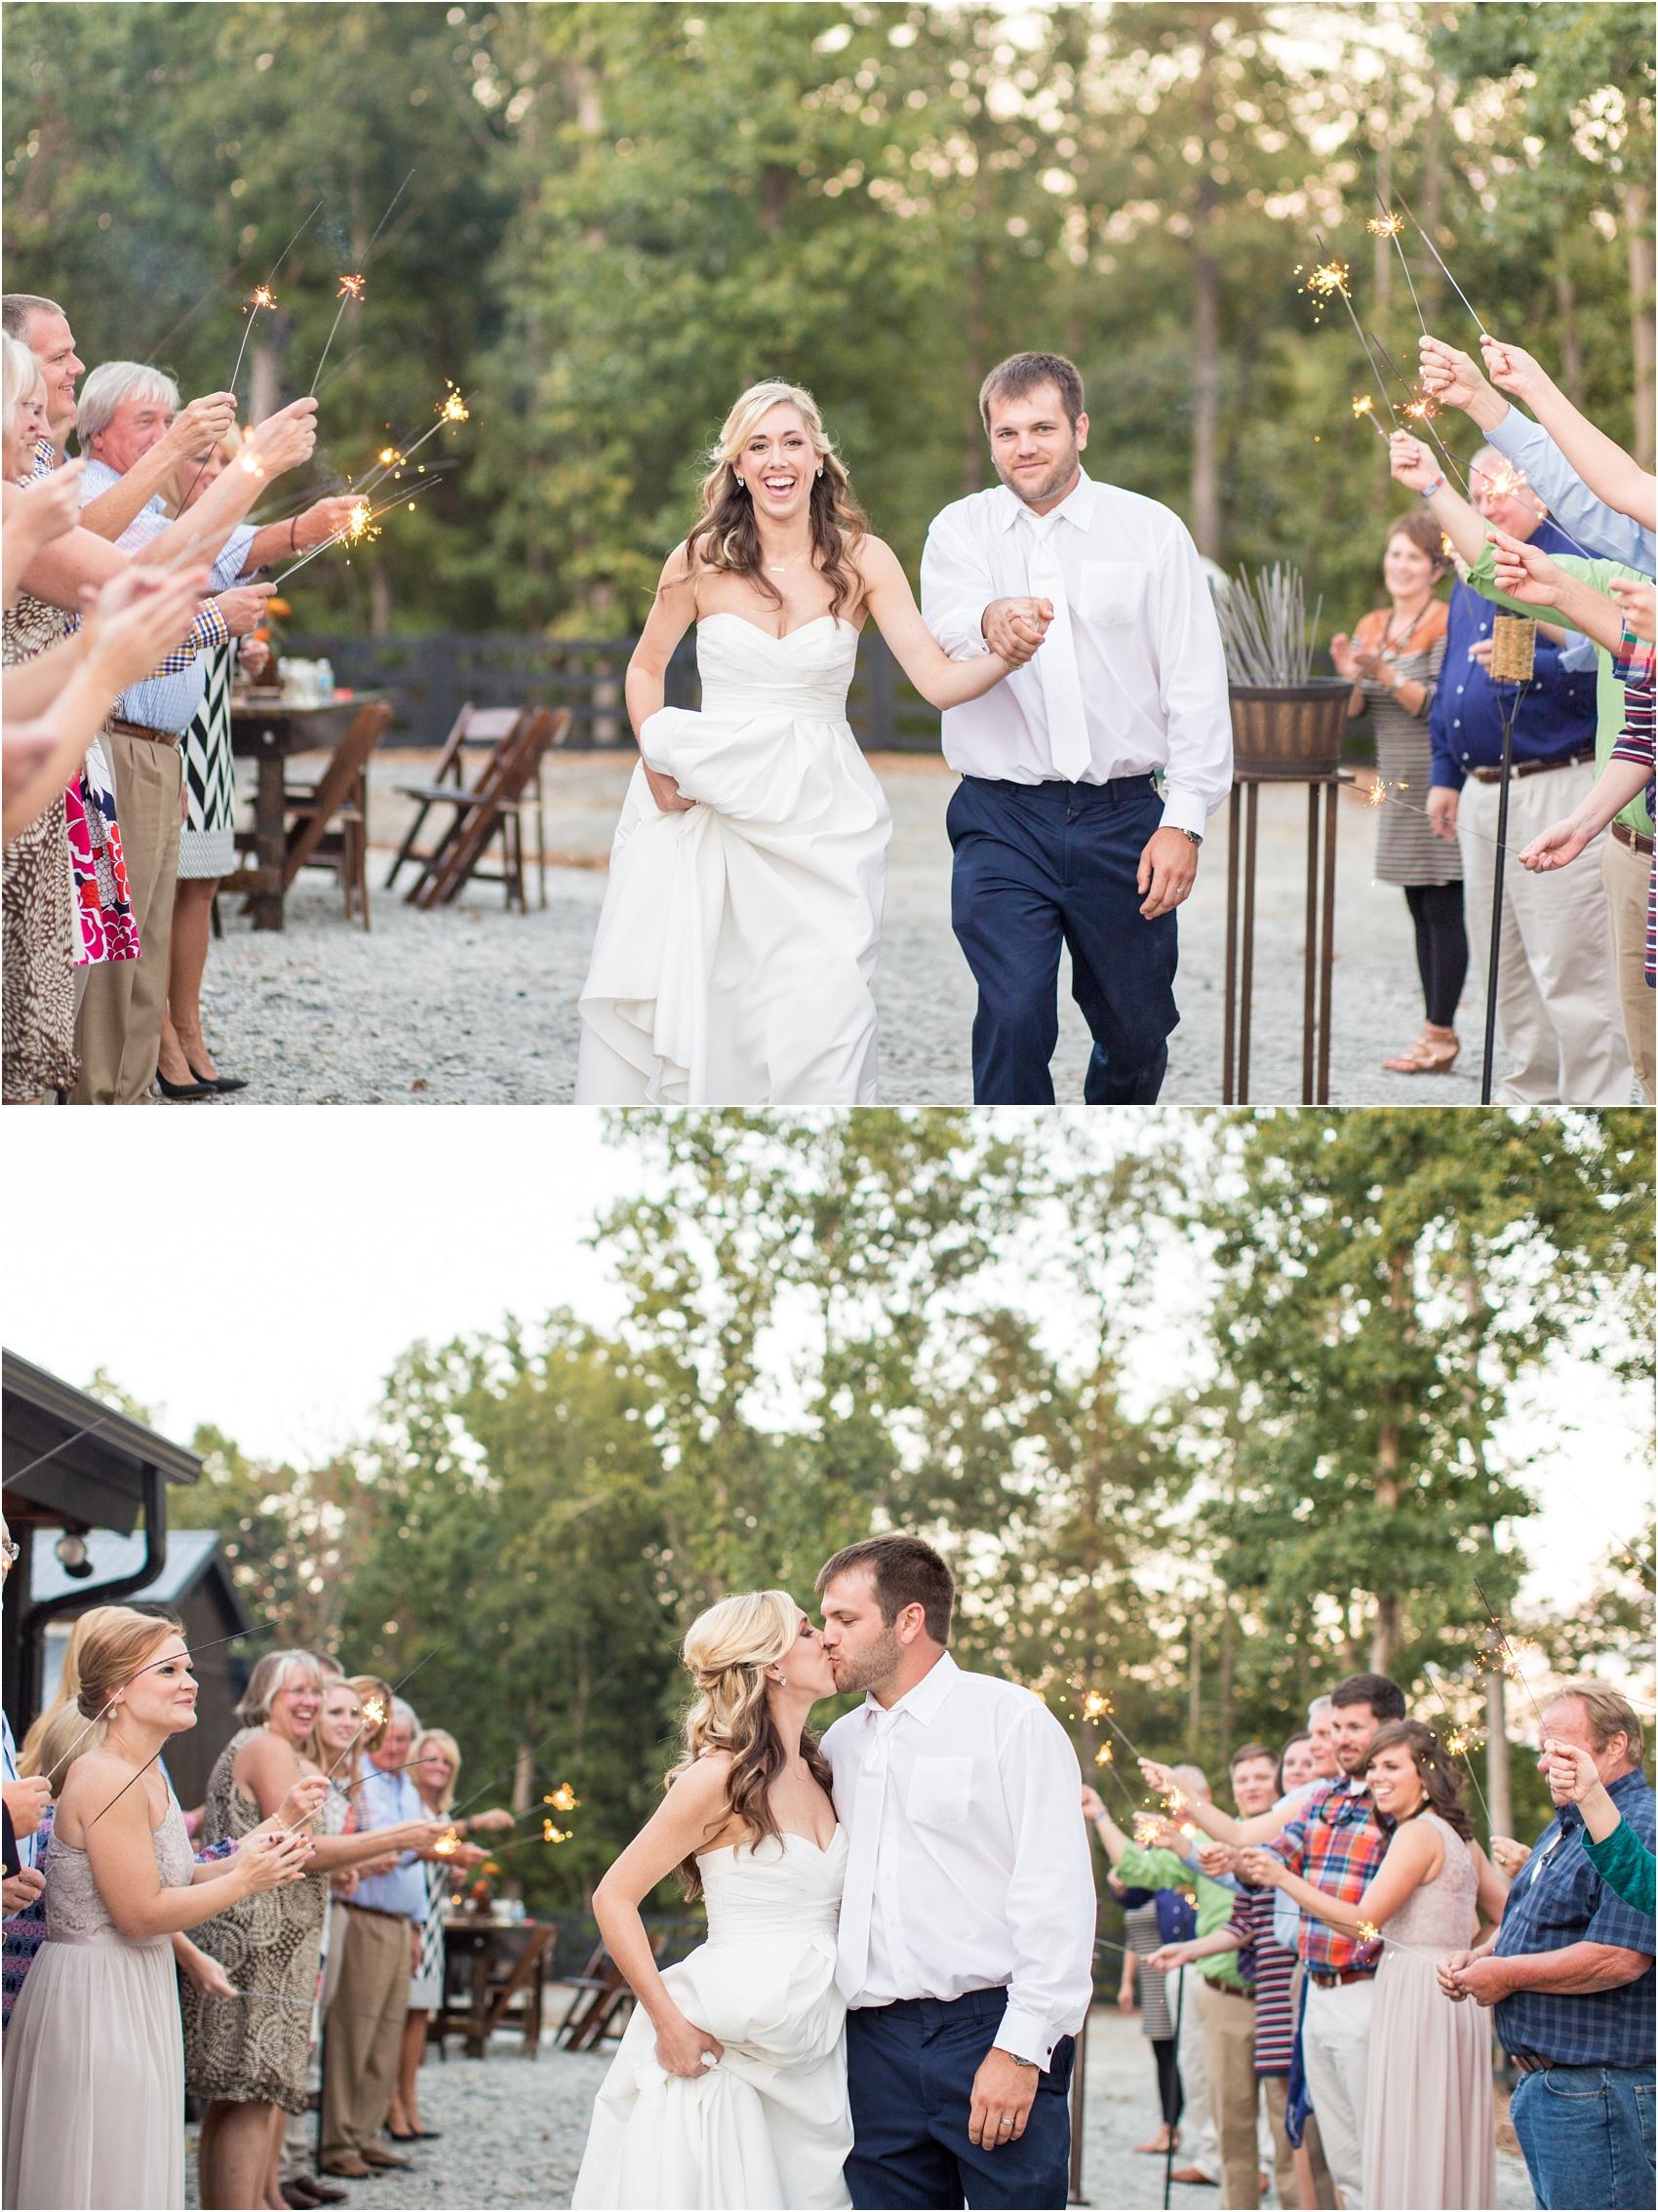 Savannah Eve Photography- Spencer Wedding- Blog-25.jpg